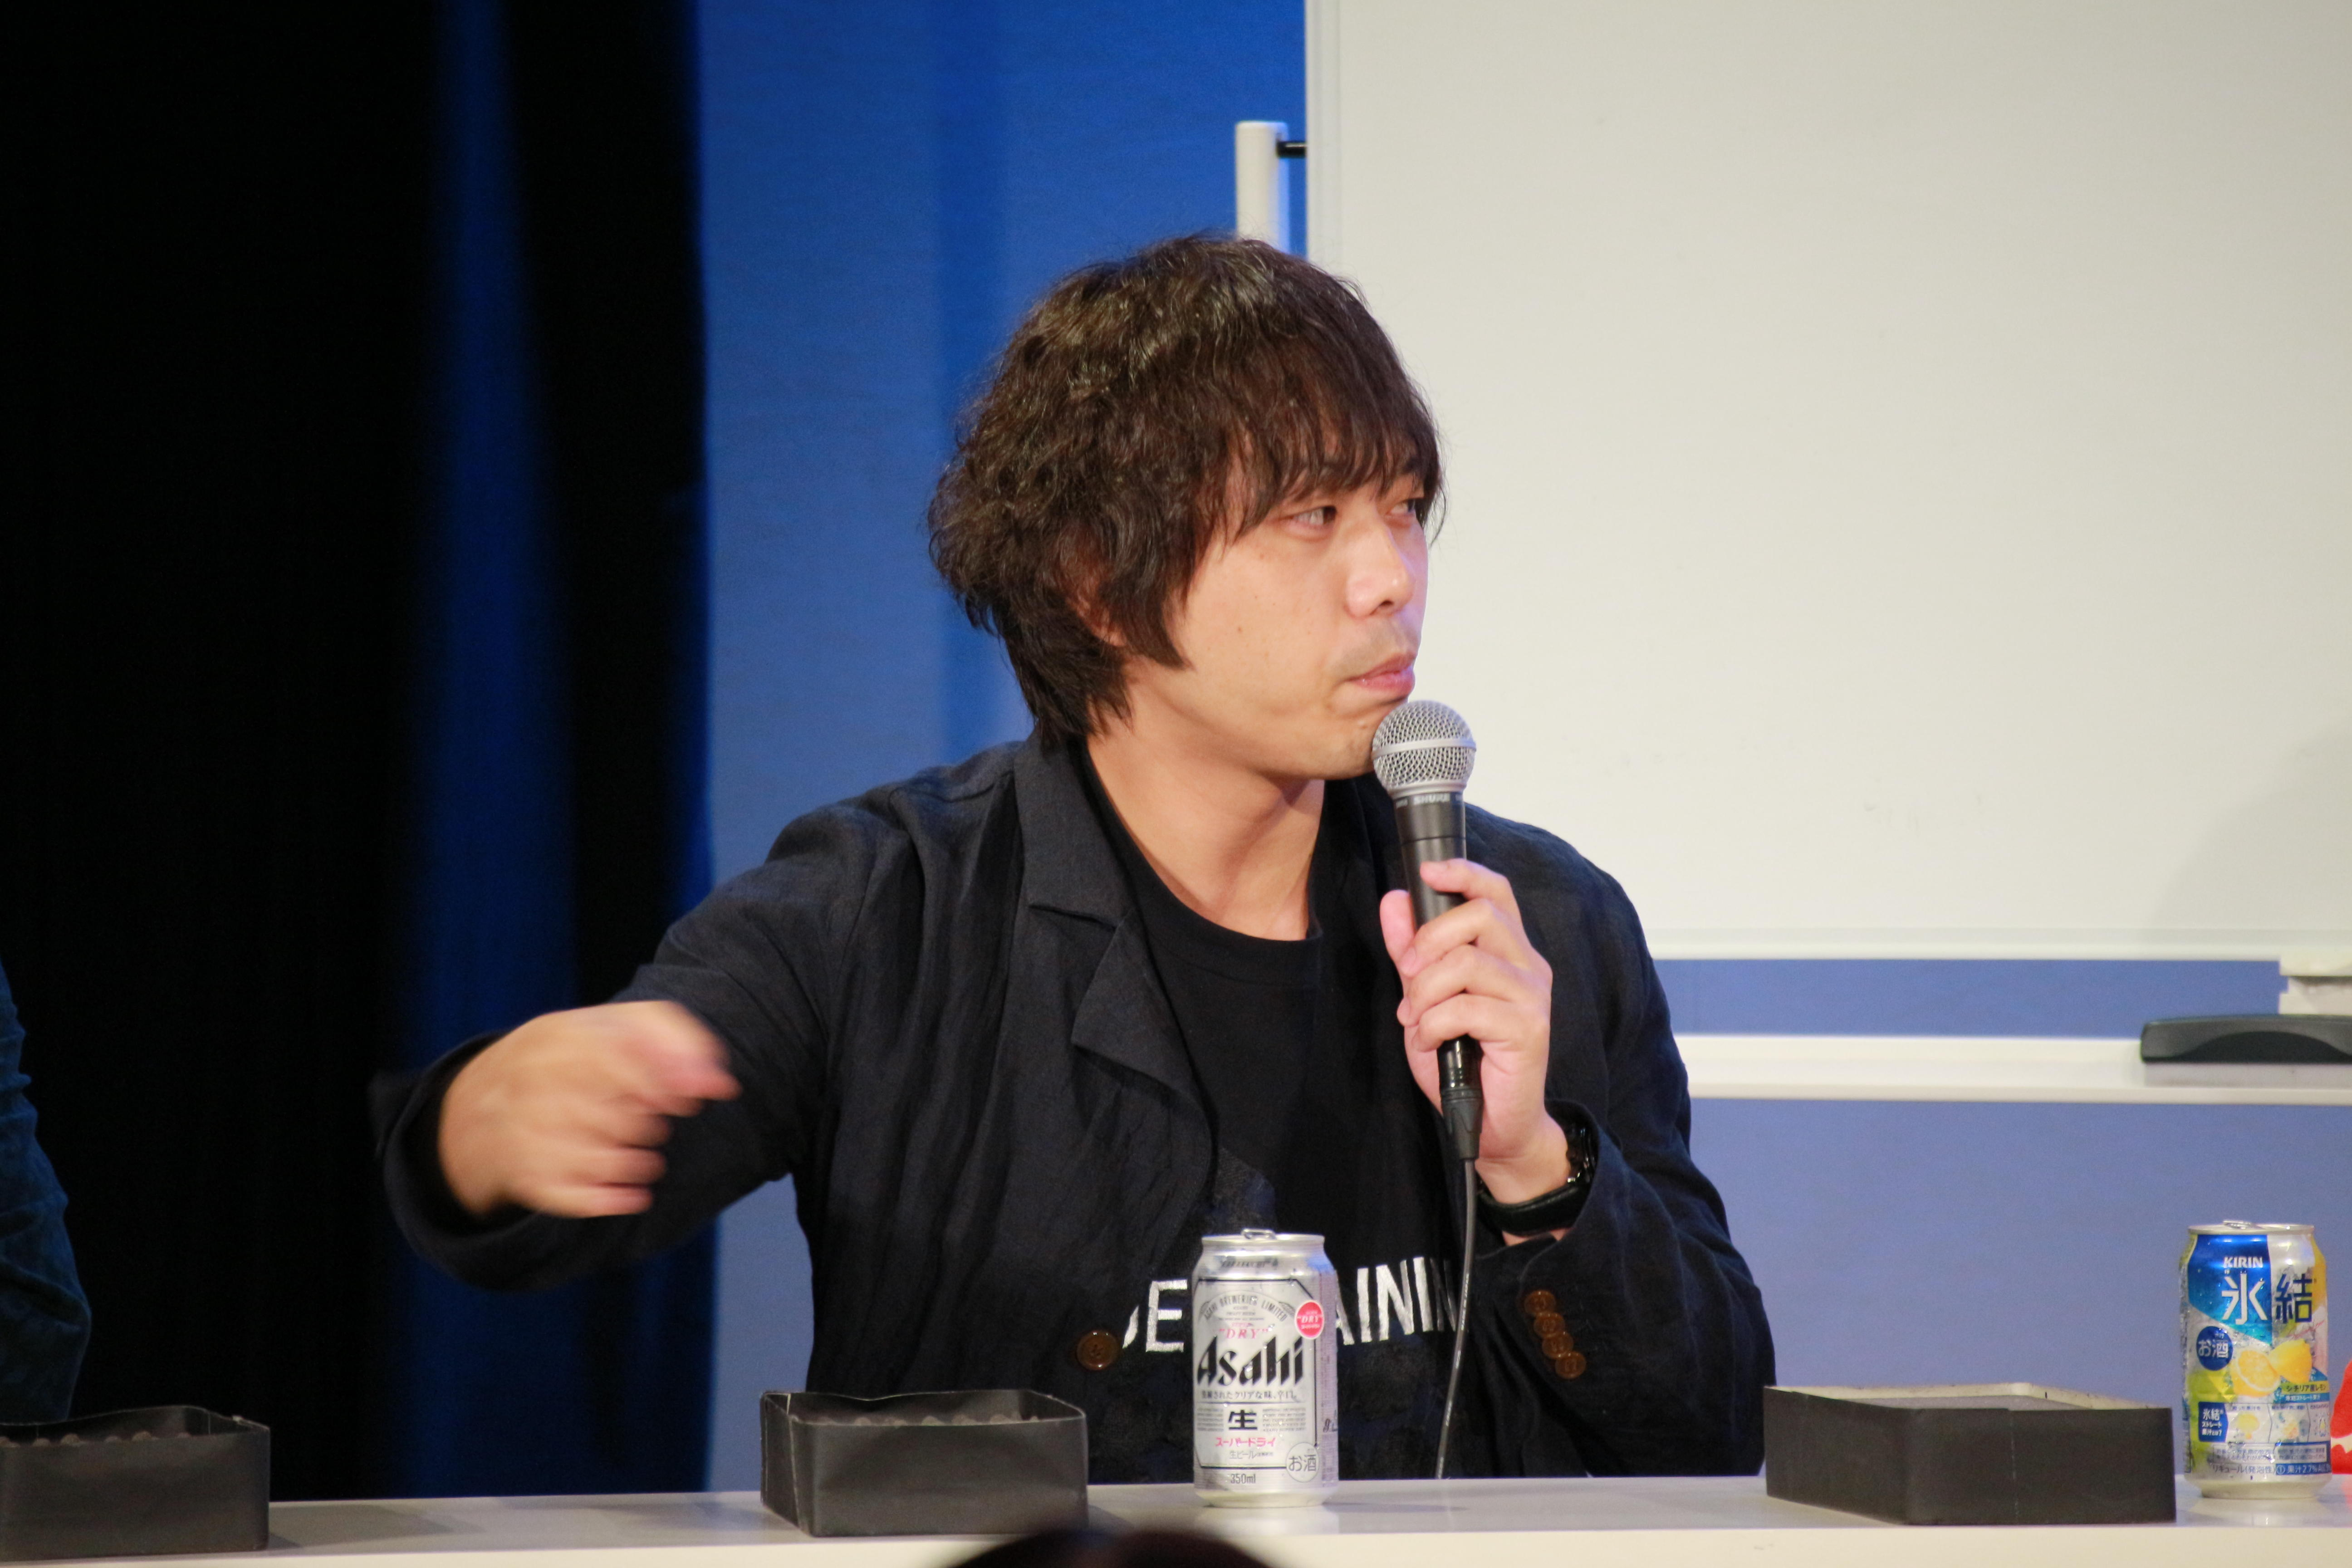 http://news.yoshimoto.co.jp/20180512231826-e6544a25a1cbb3498afbe9e86e1e9b5935f34bbc.jpg